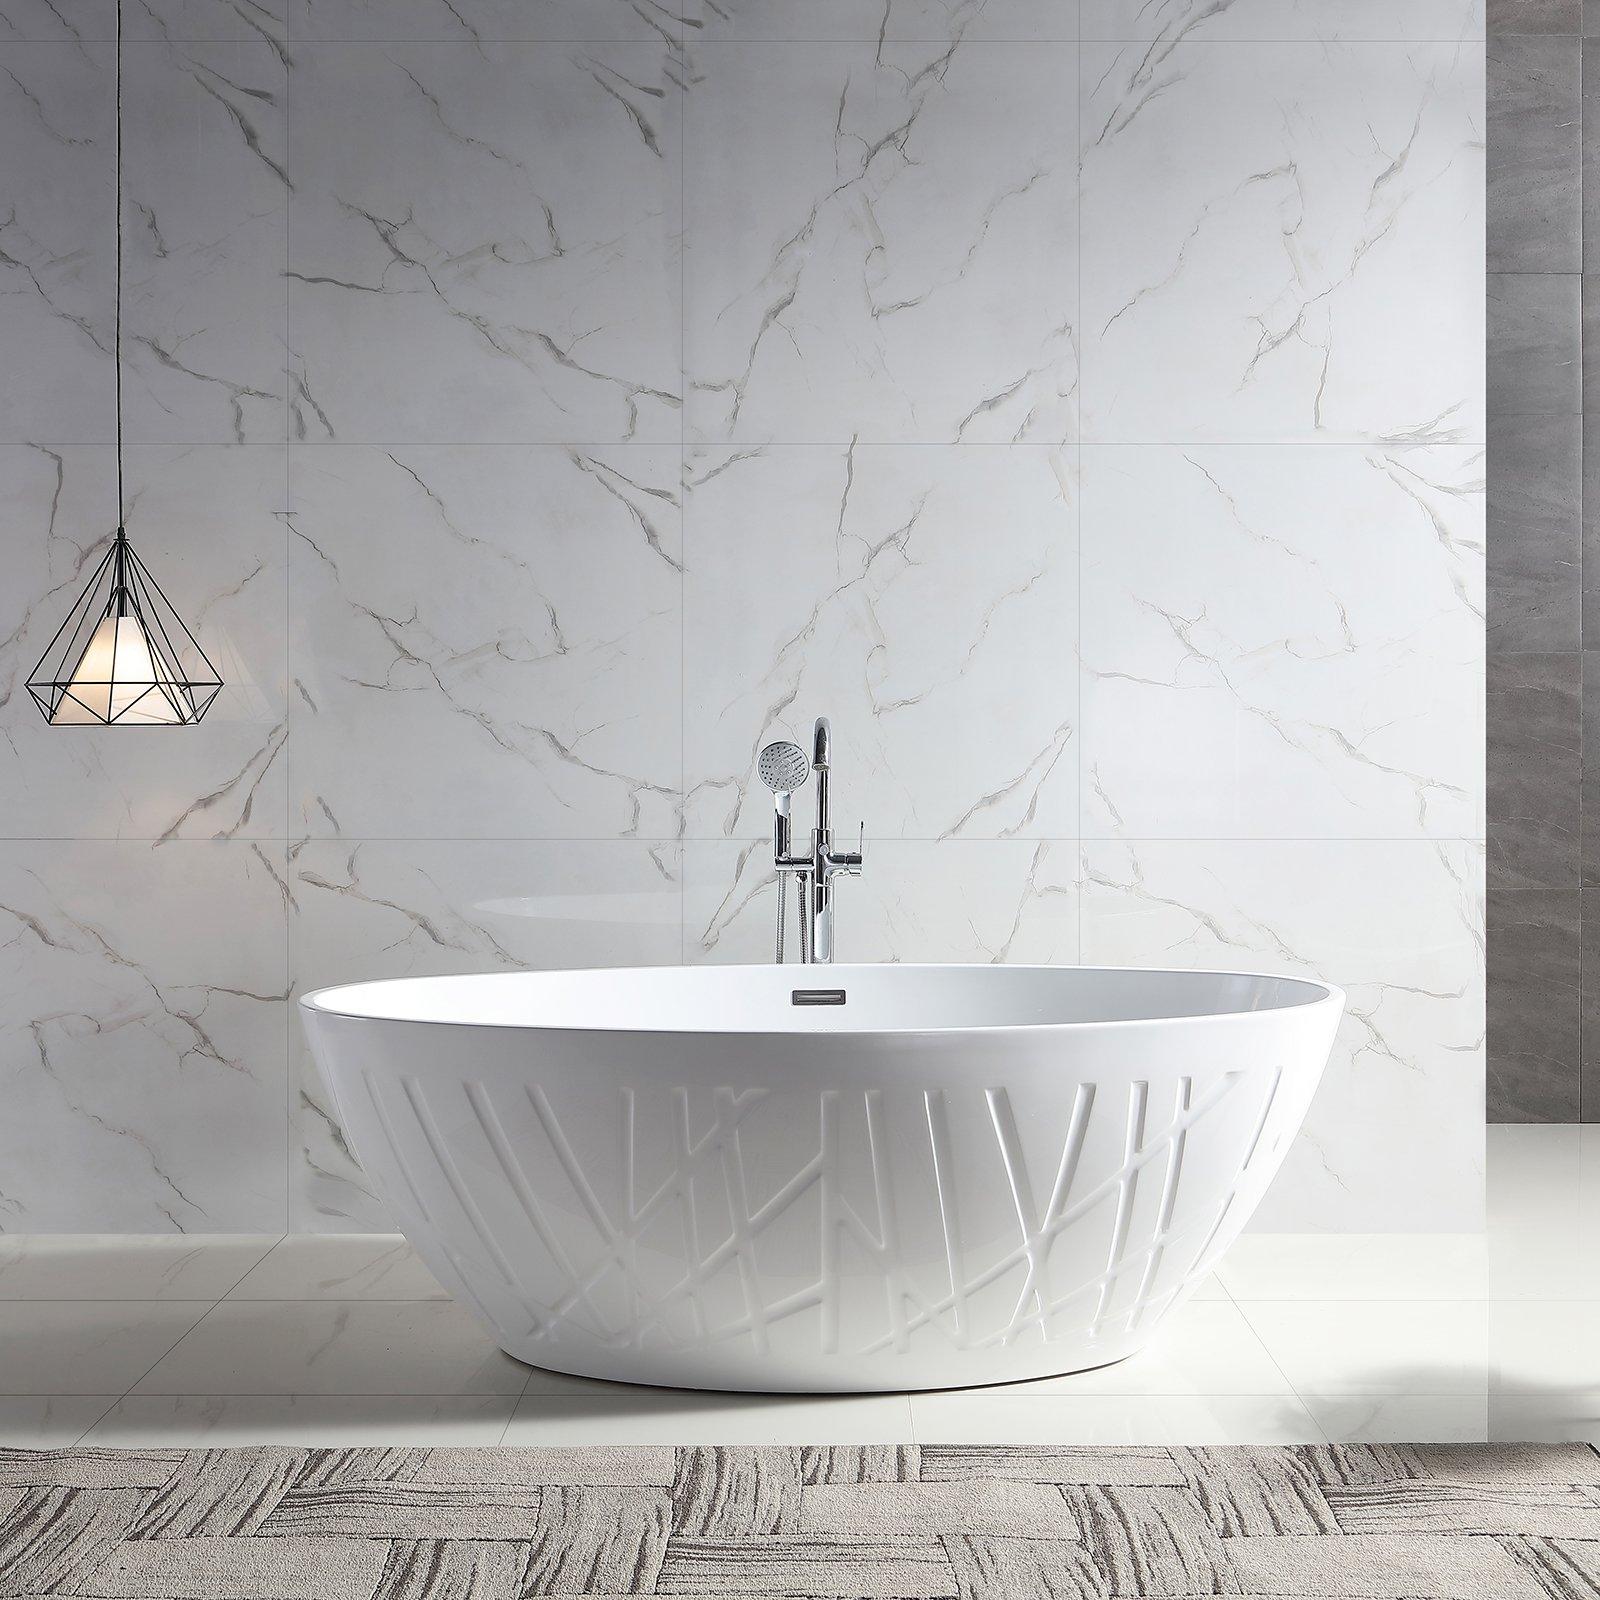 Freistehende Badewanne LEO Acryl Weiß glänzend - 175 x 100 x 58 cm - Standarmatur wählbar